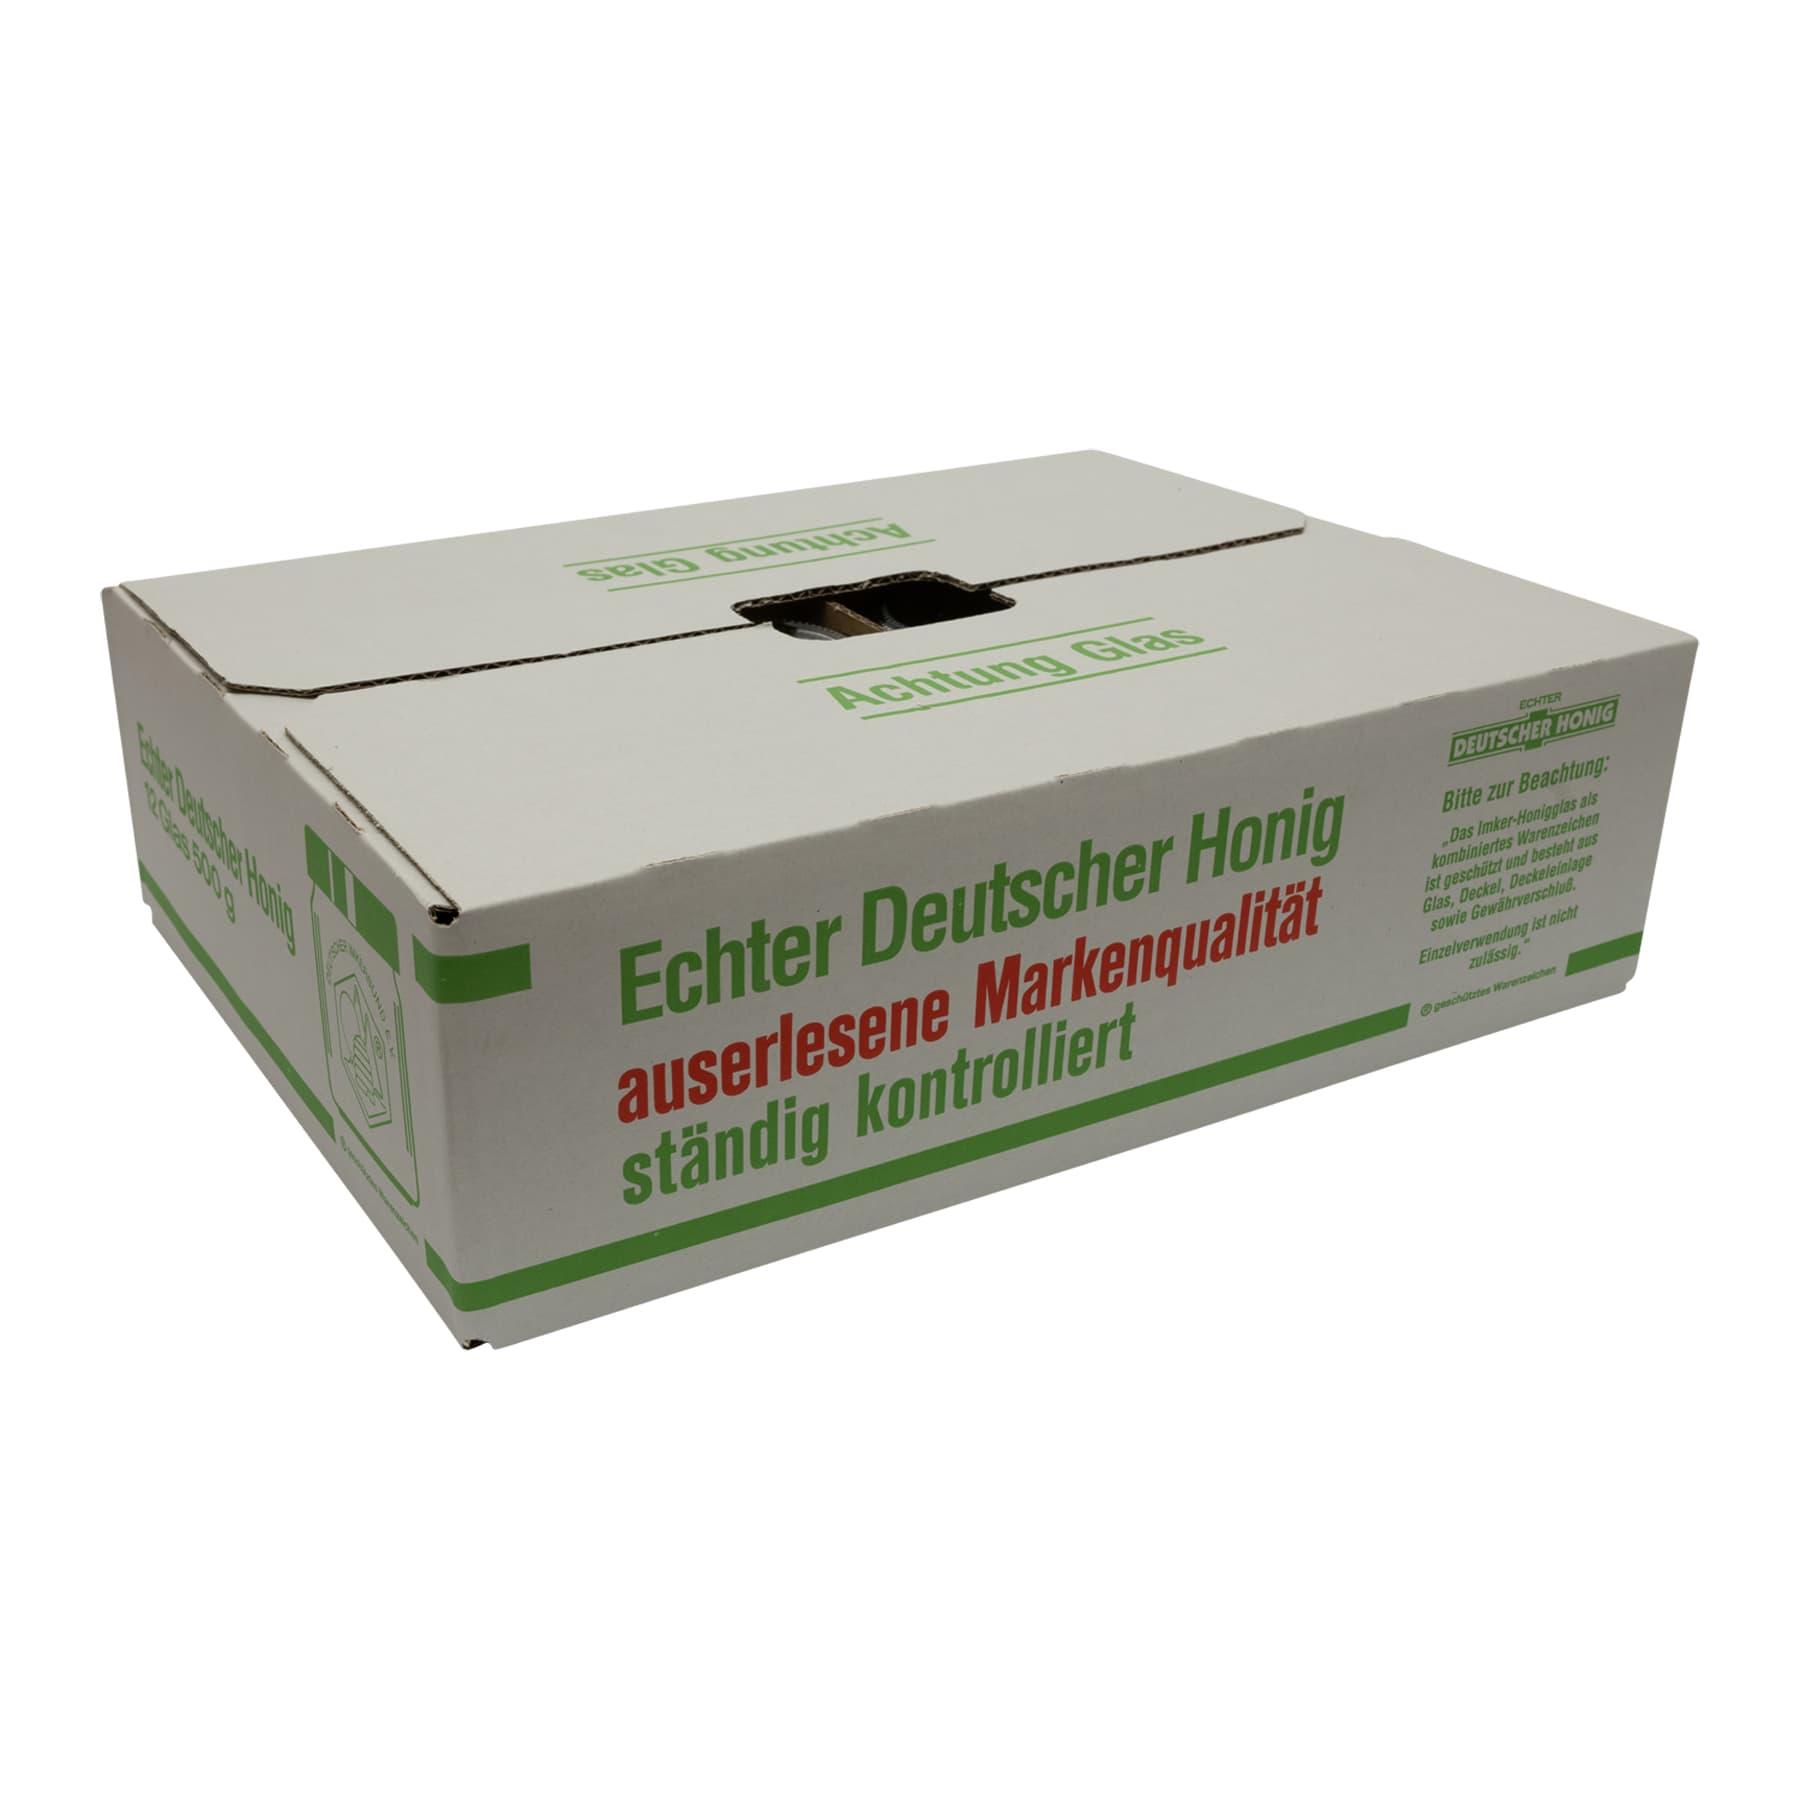 DIB-Gläser 500 g 1 PAL(2244 Stk) inkl. Deckel u. Umkarton, bundesweit FREI HAUS